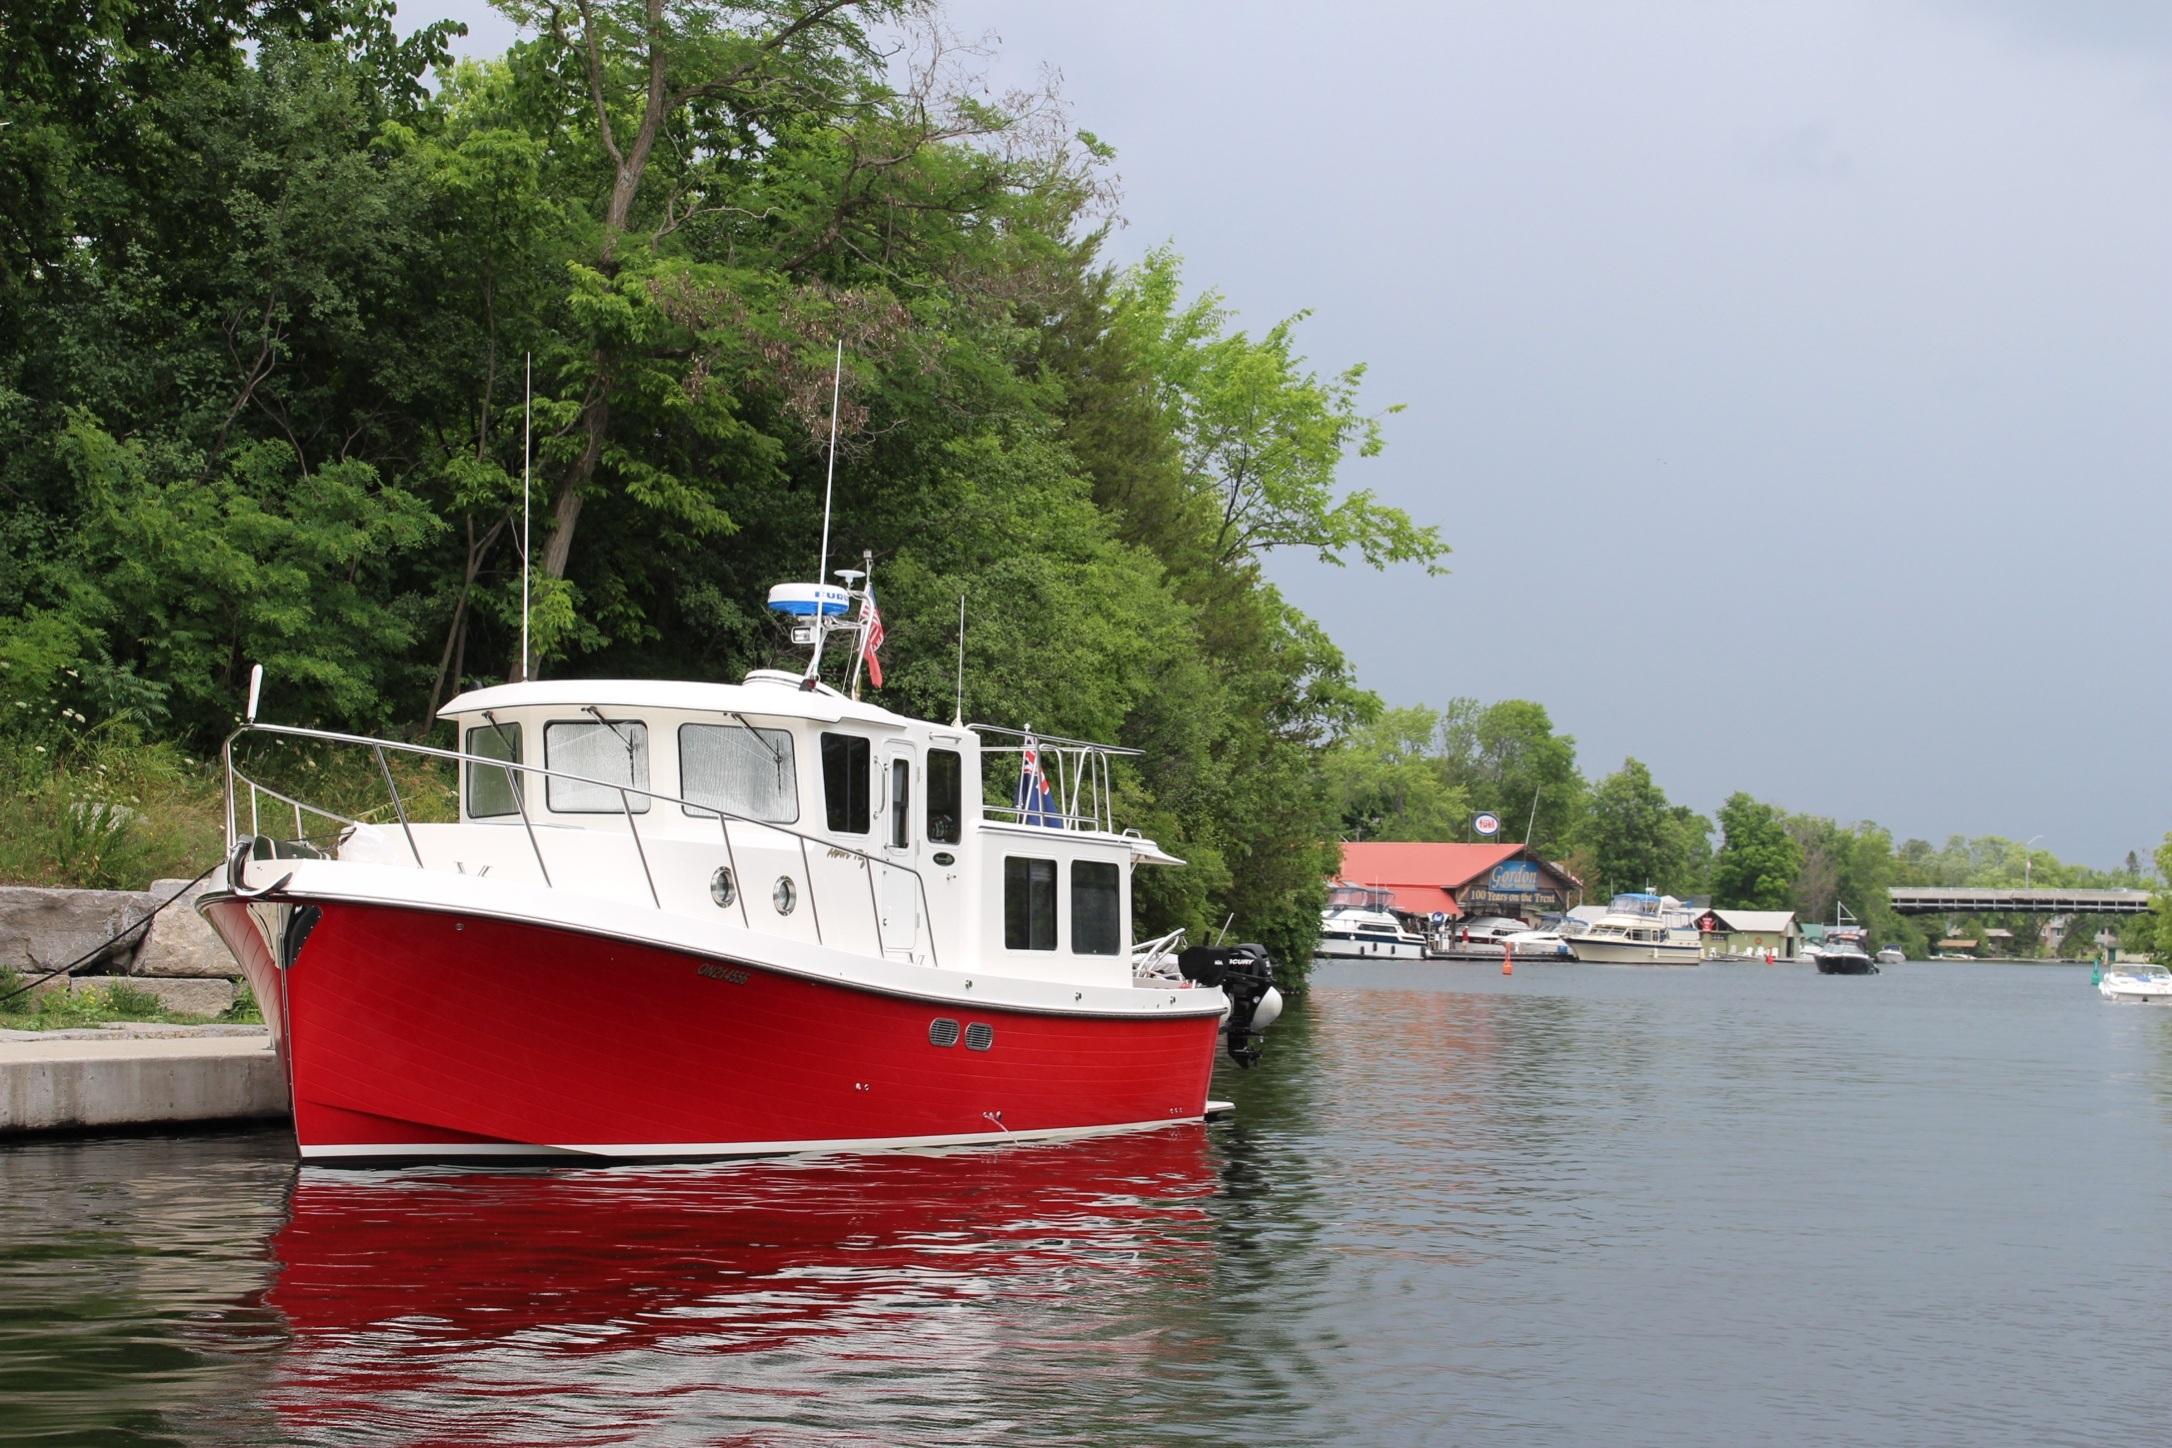 Boat #14.jpg